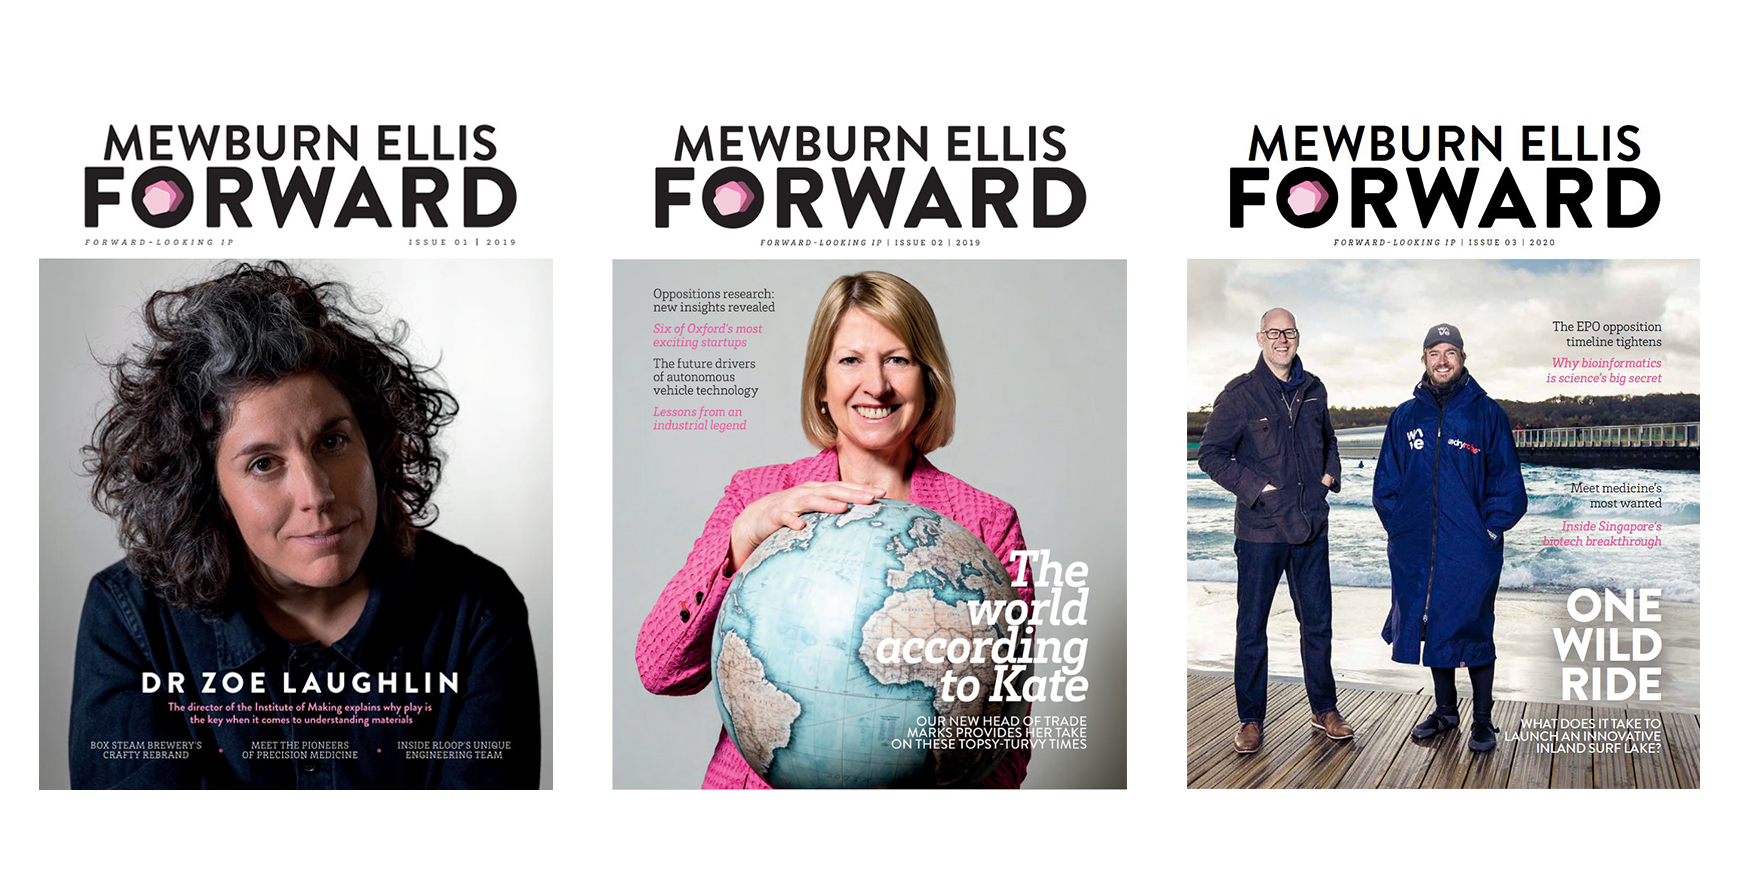 forwardmagazineissues